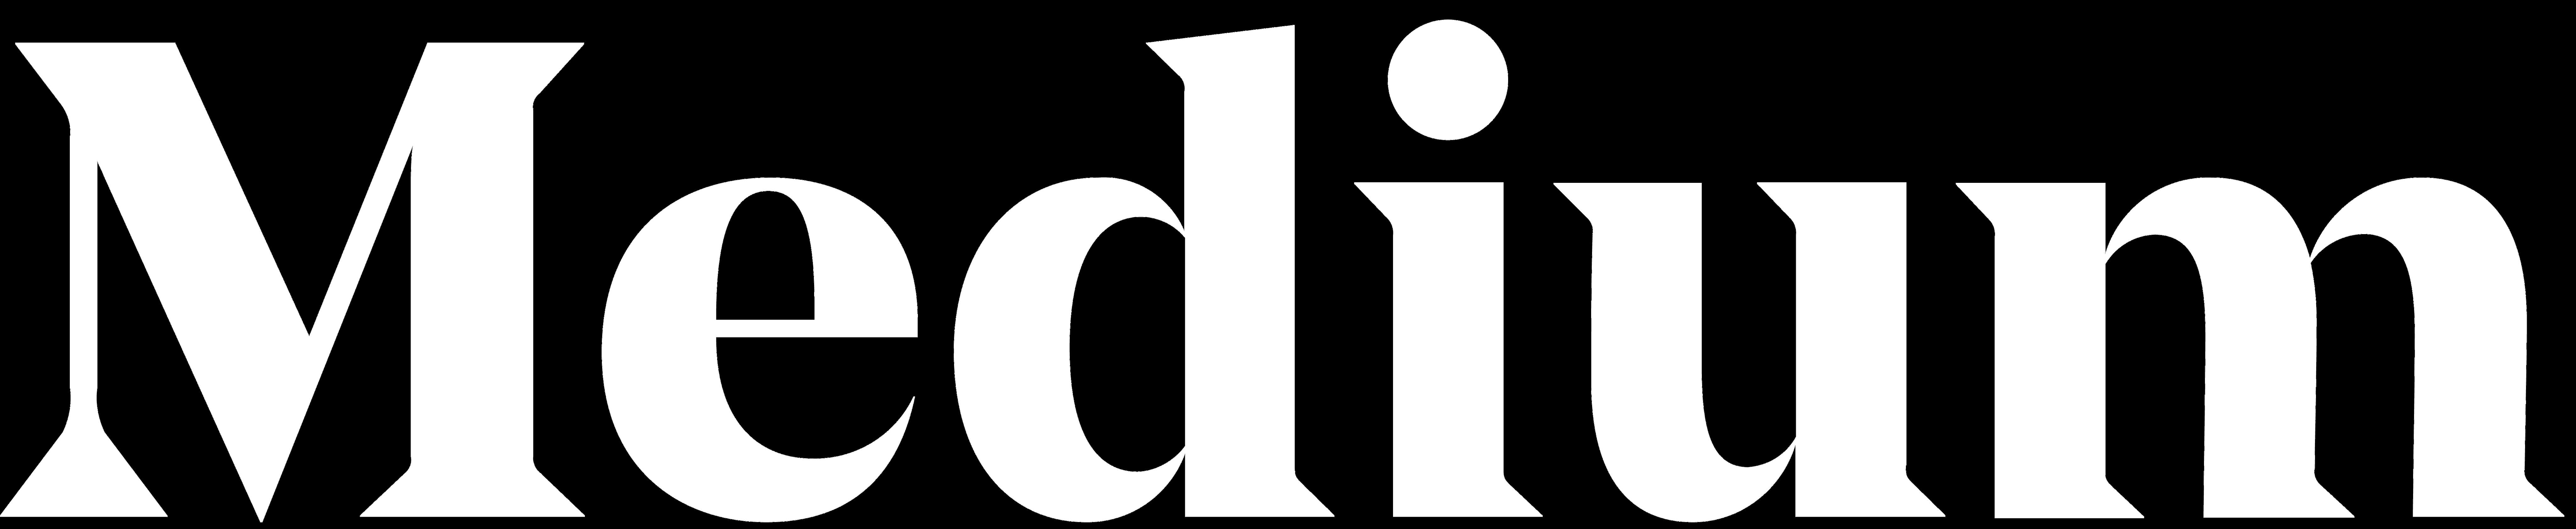 wordmark-white-medium